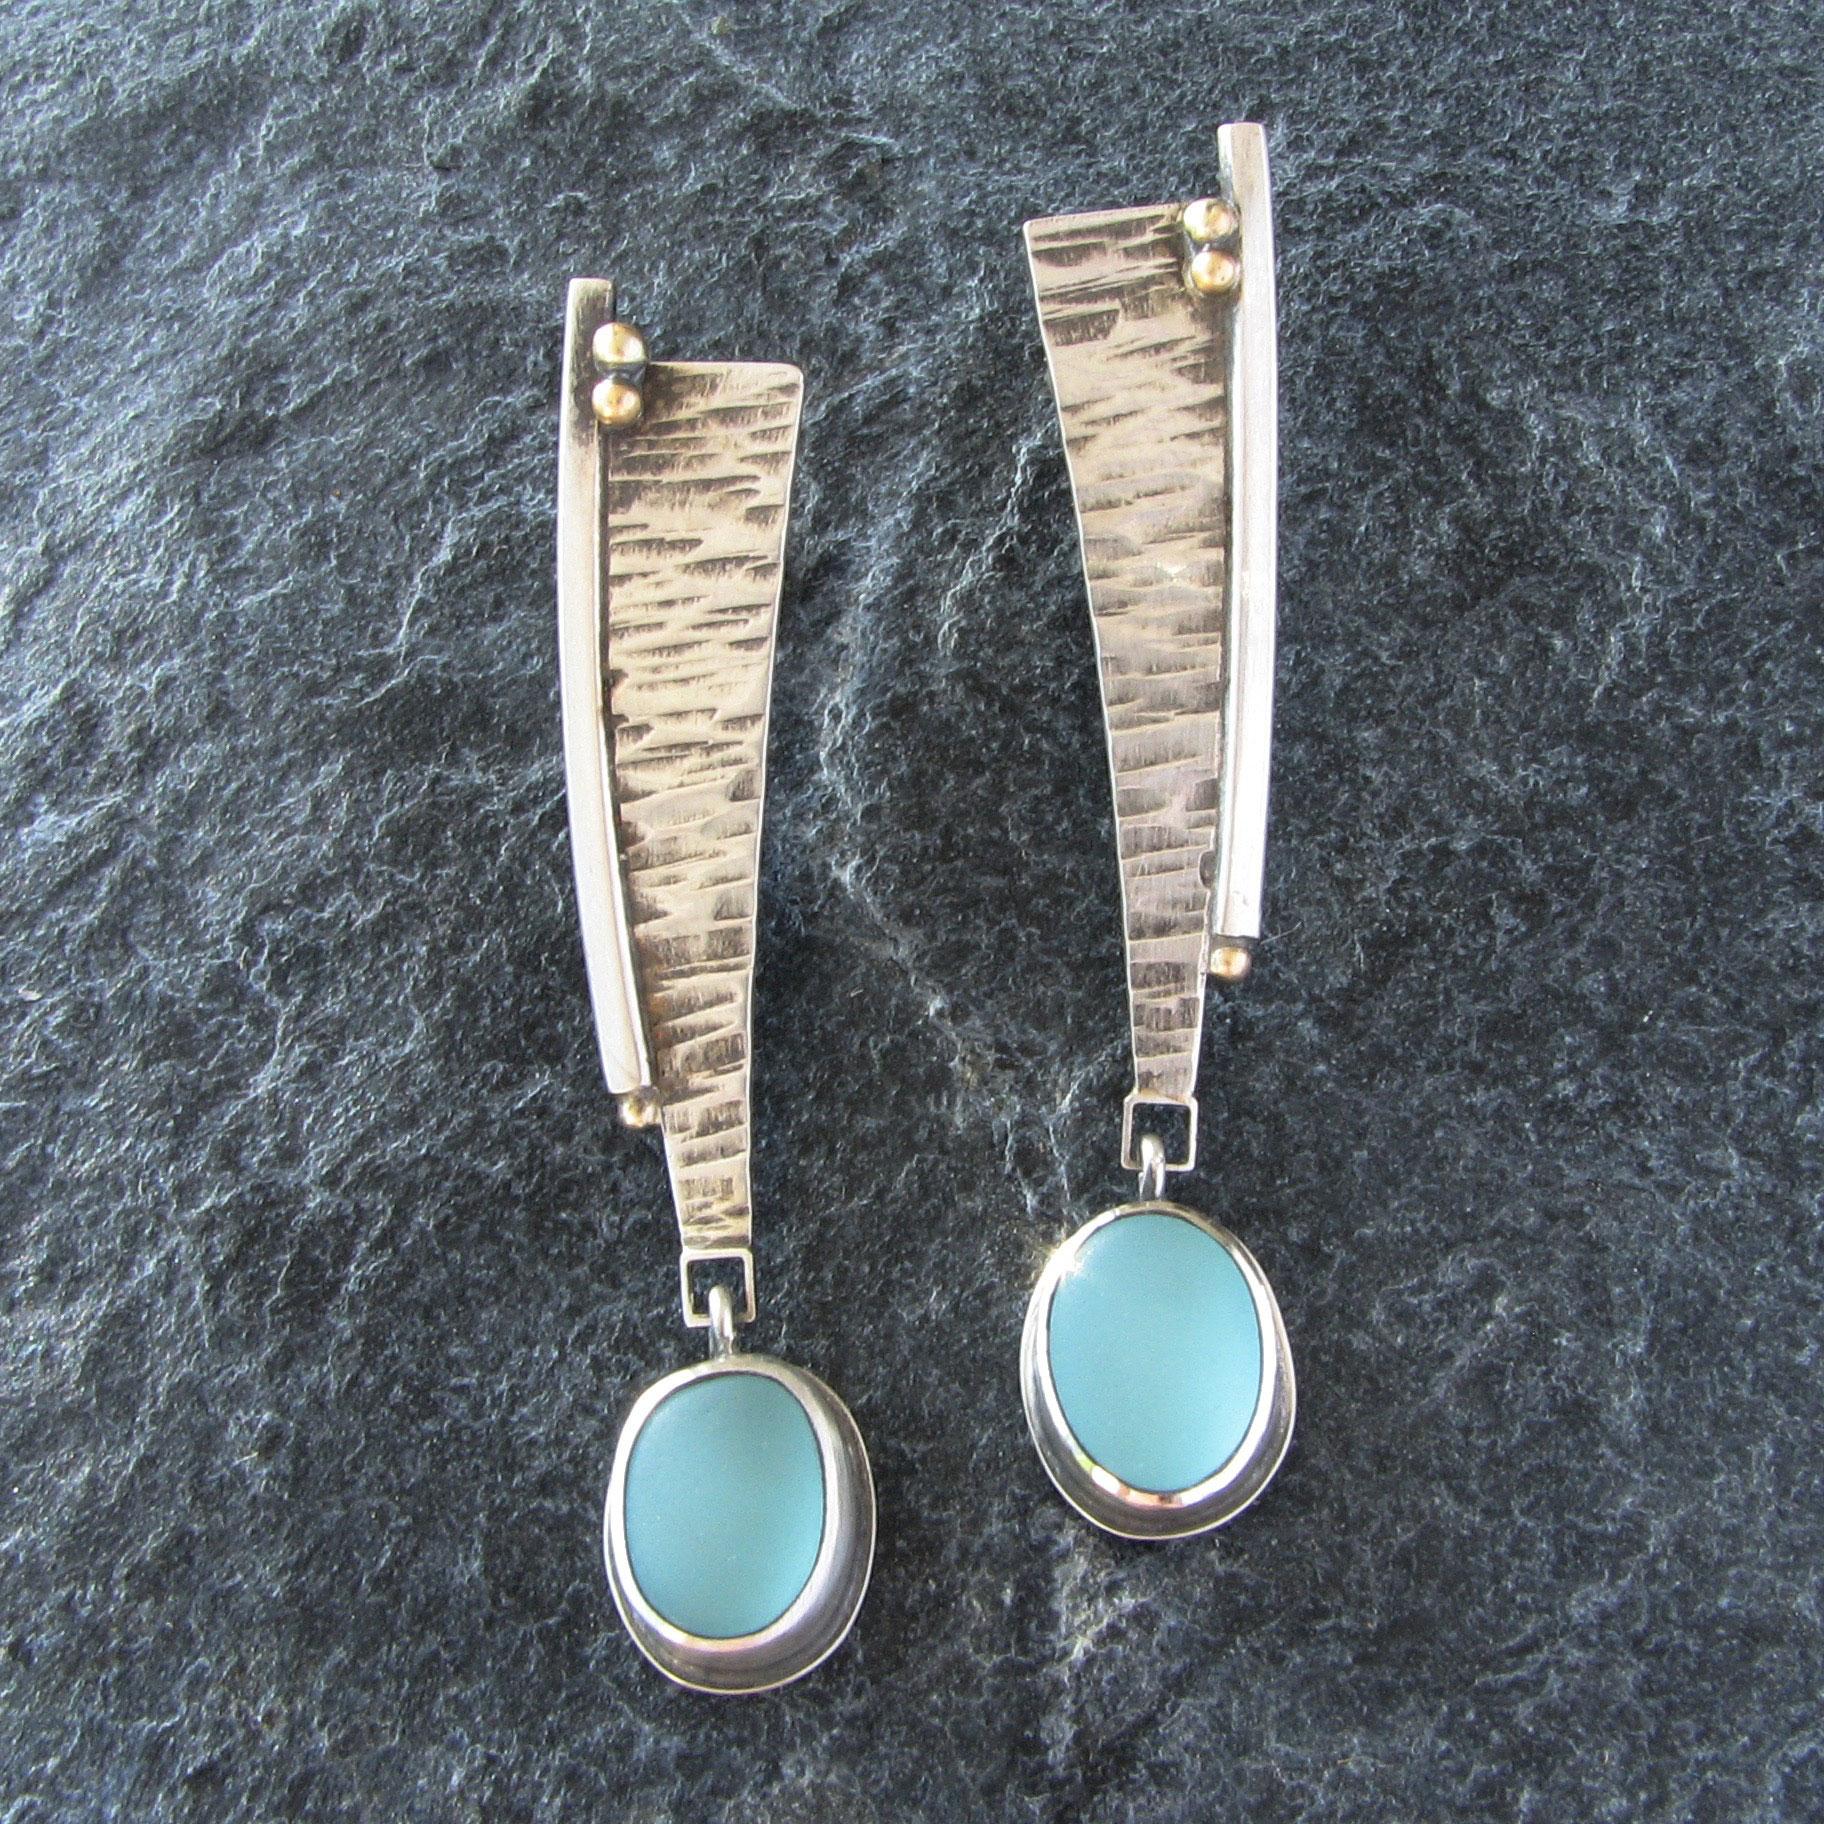 sea-glass-earrings-monica-branstrom-studio.jpg